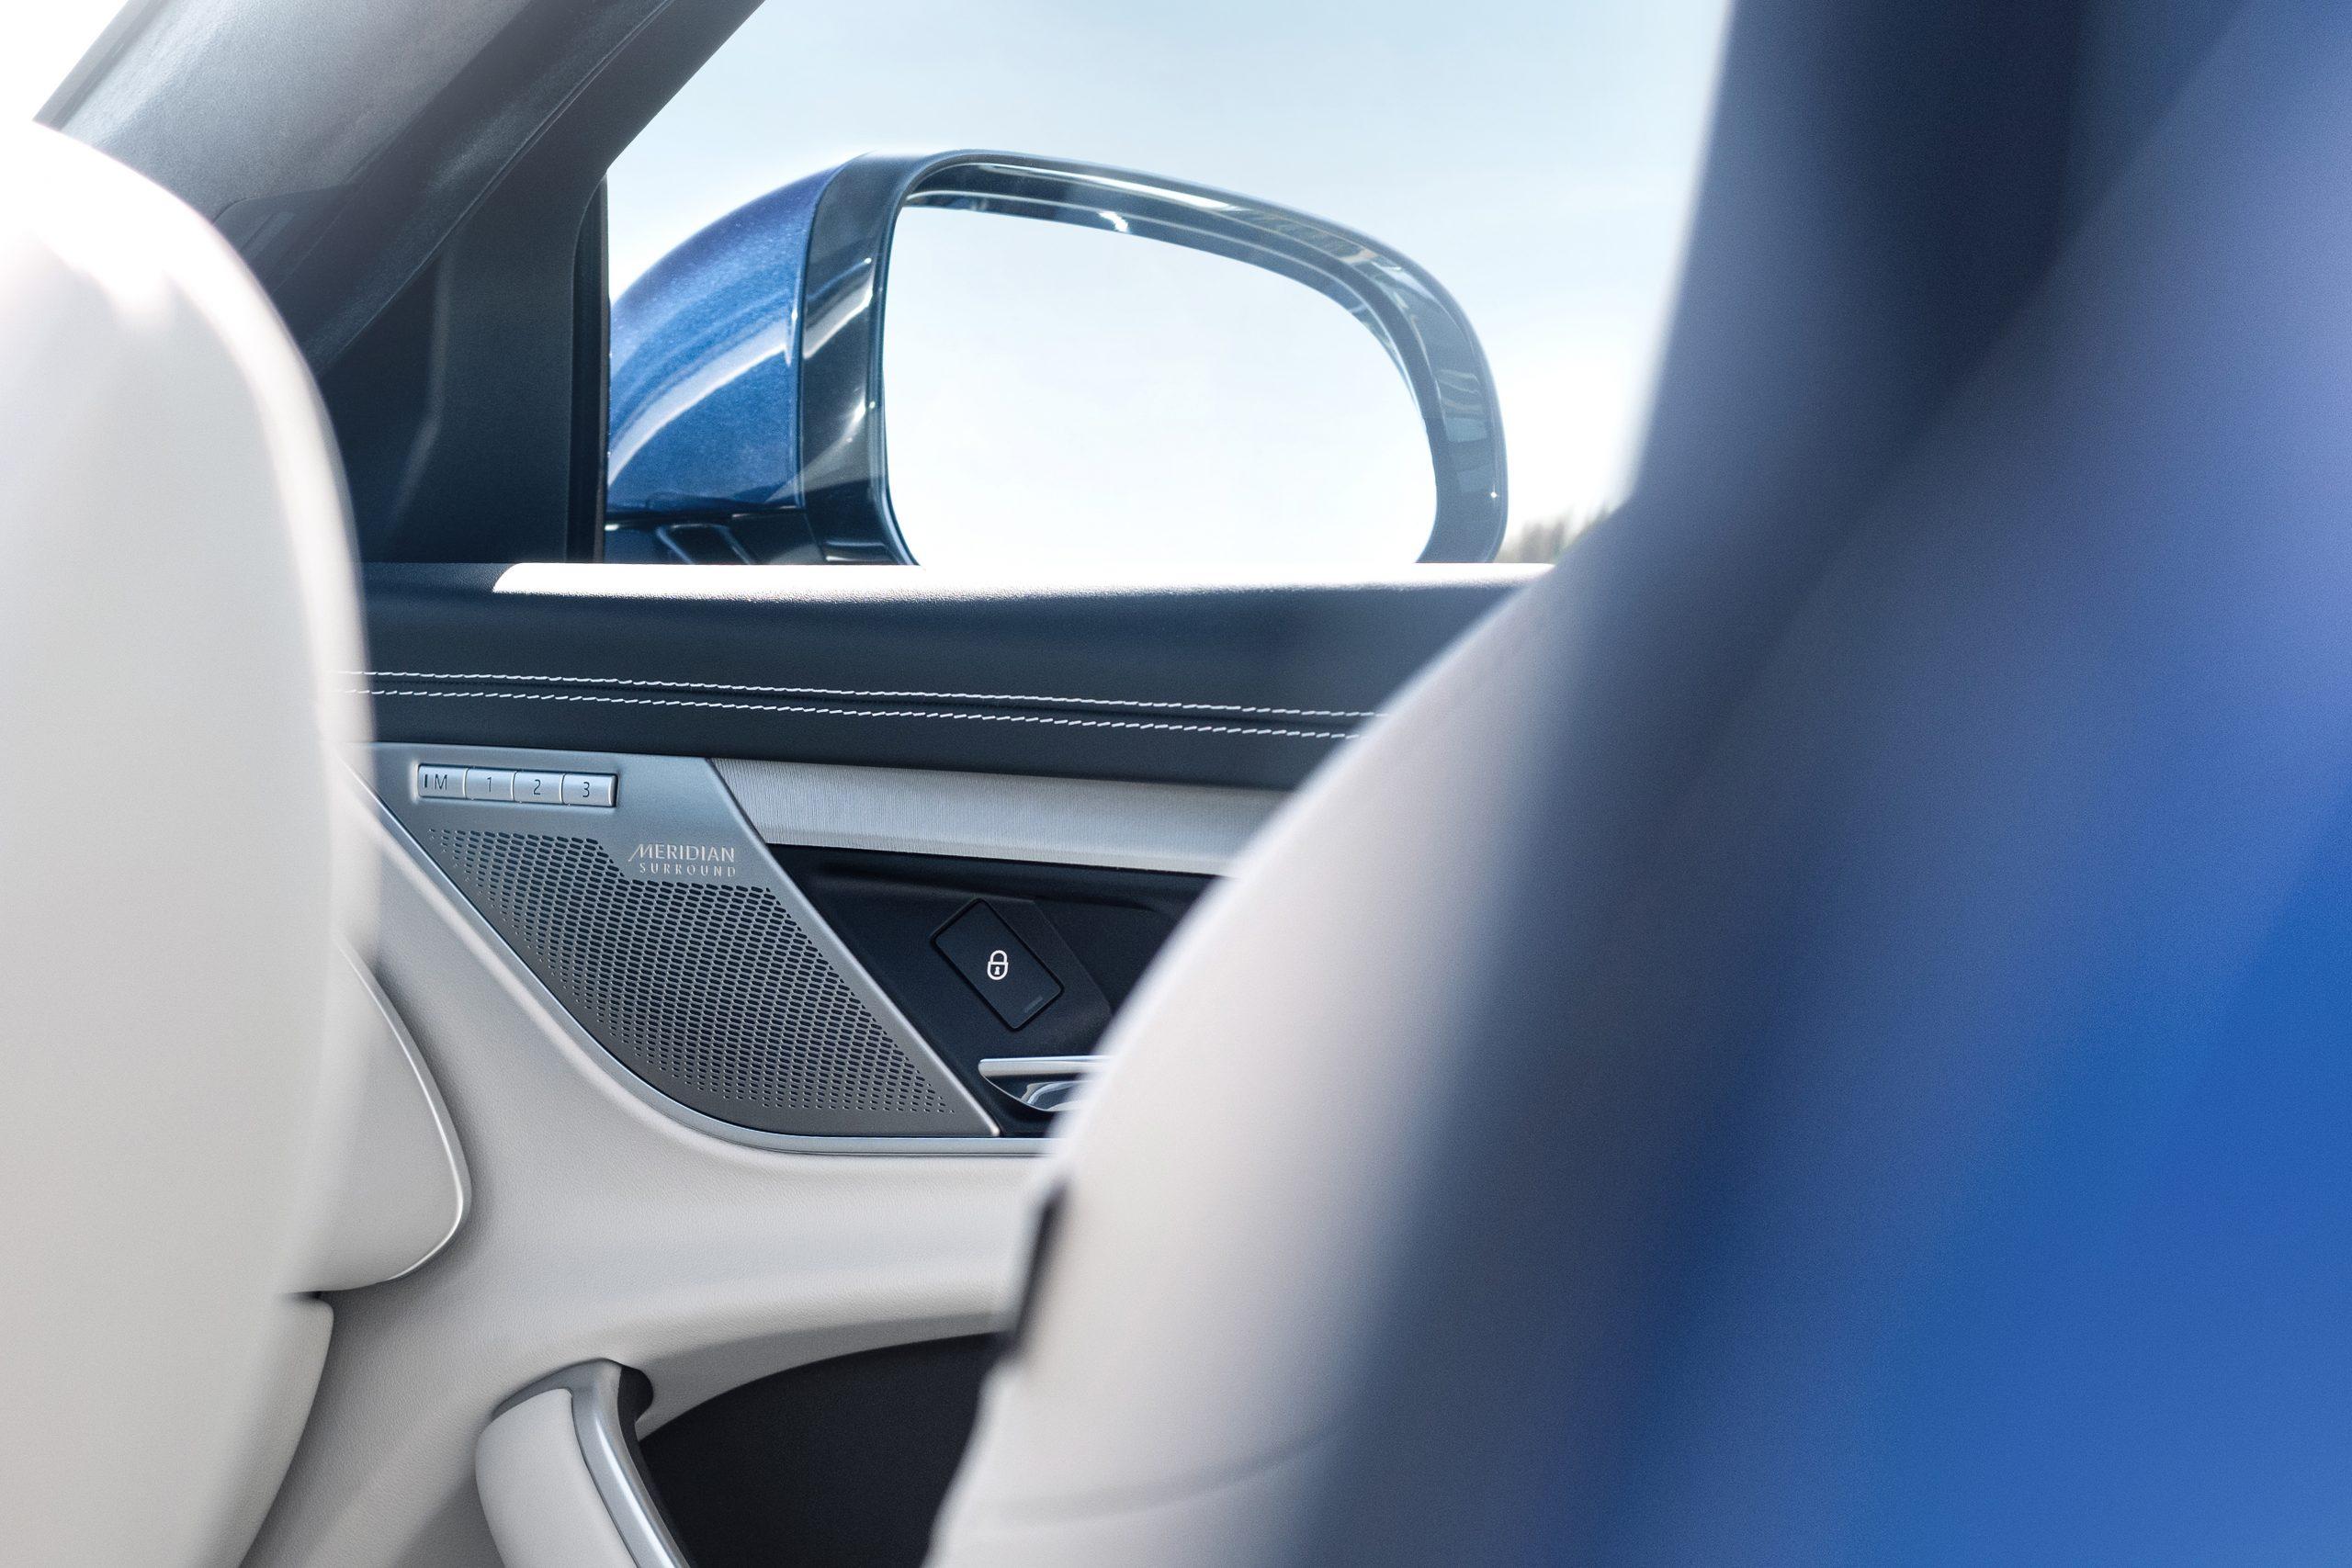 2021 Jaguar XF interior meridian sound